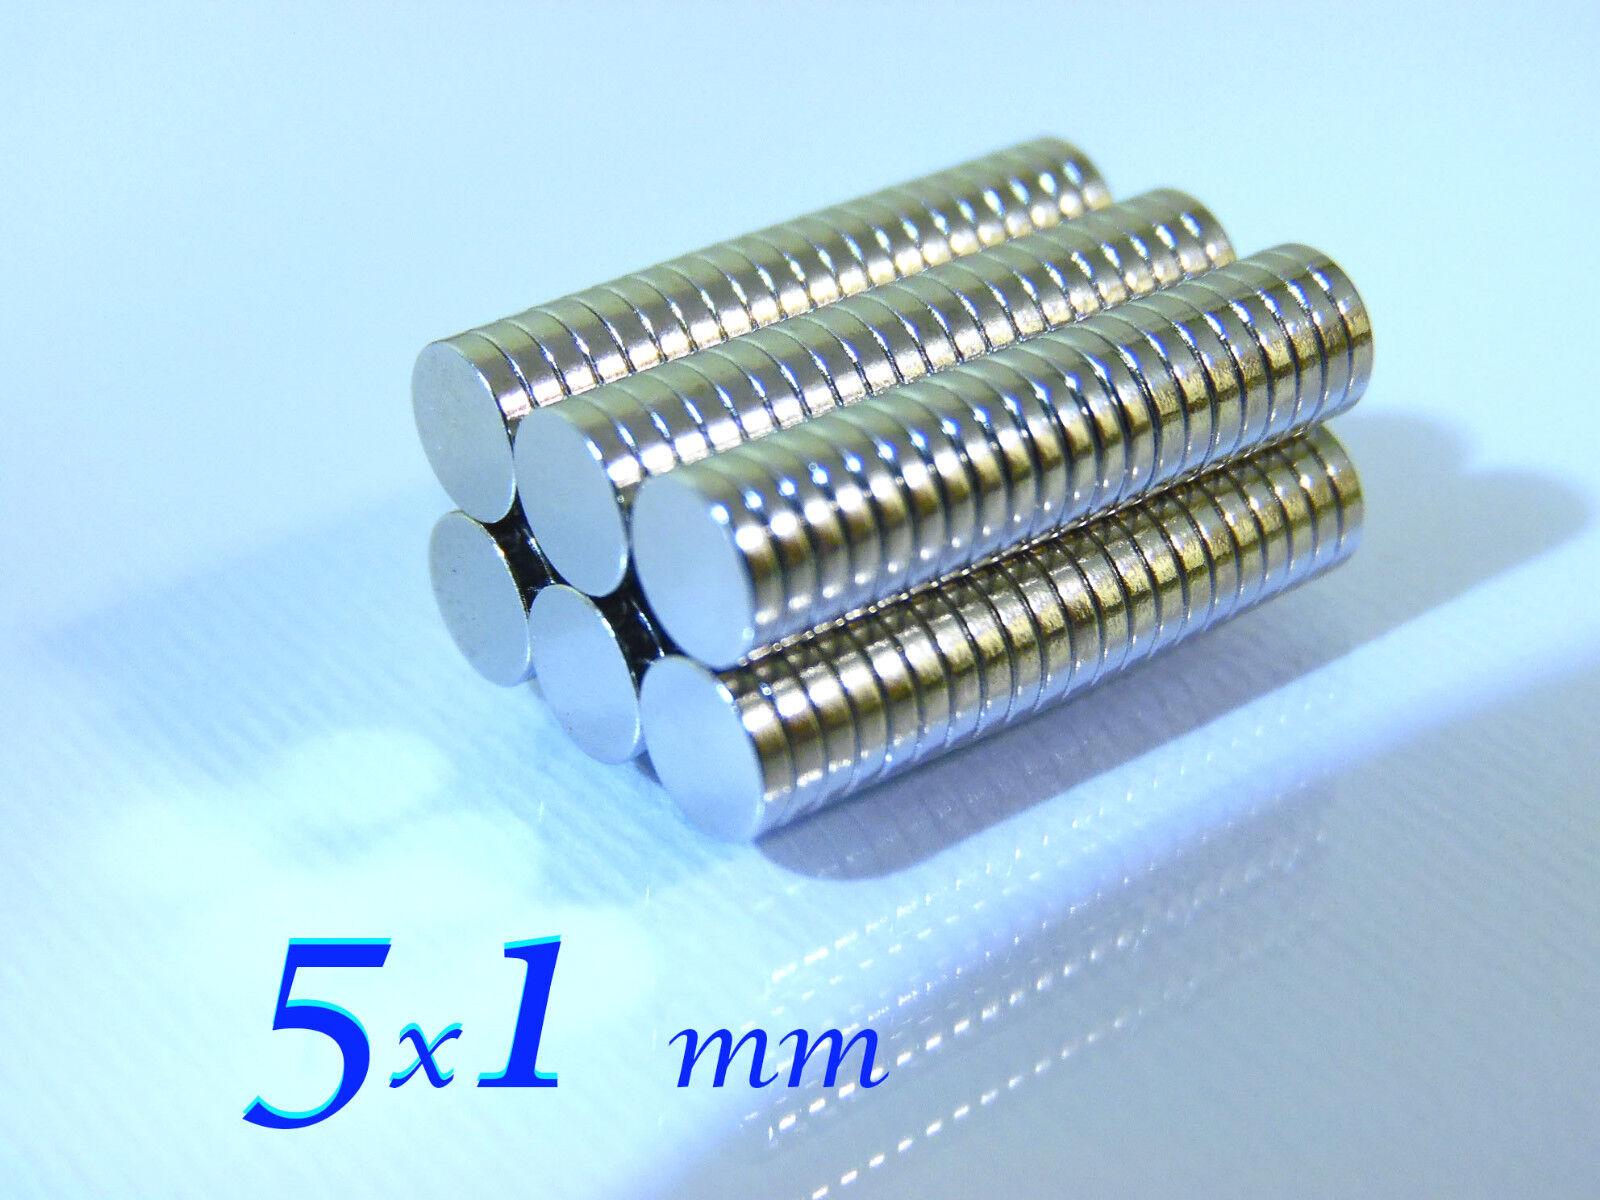 100 CALAMITE N48 MAGNETI NEODIMIO 100  pezzi   5x1 mm  POTENTI magnete per FIMO